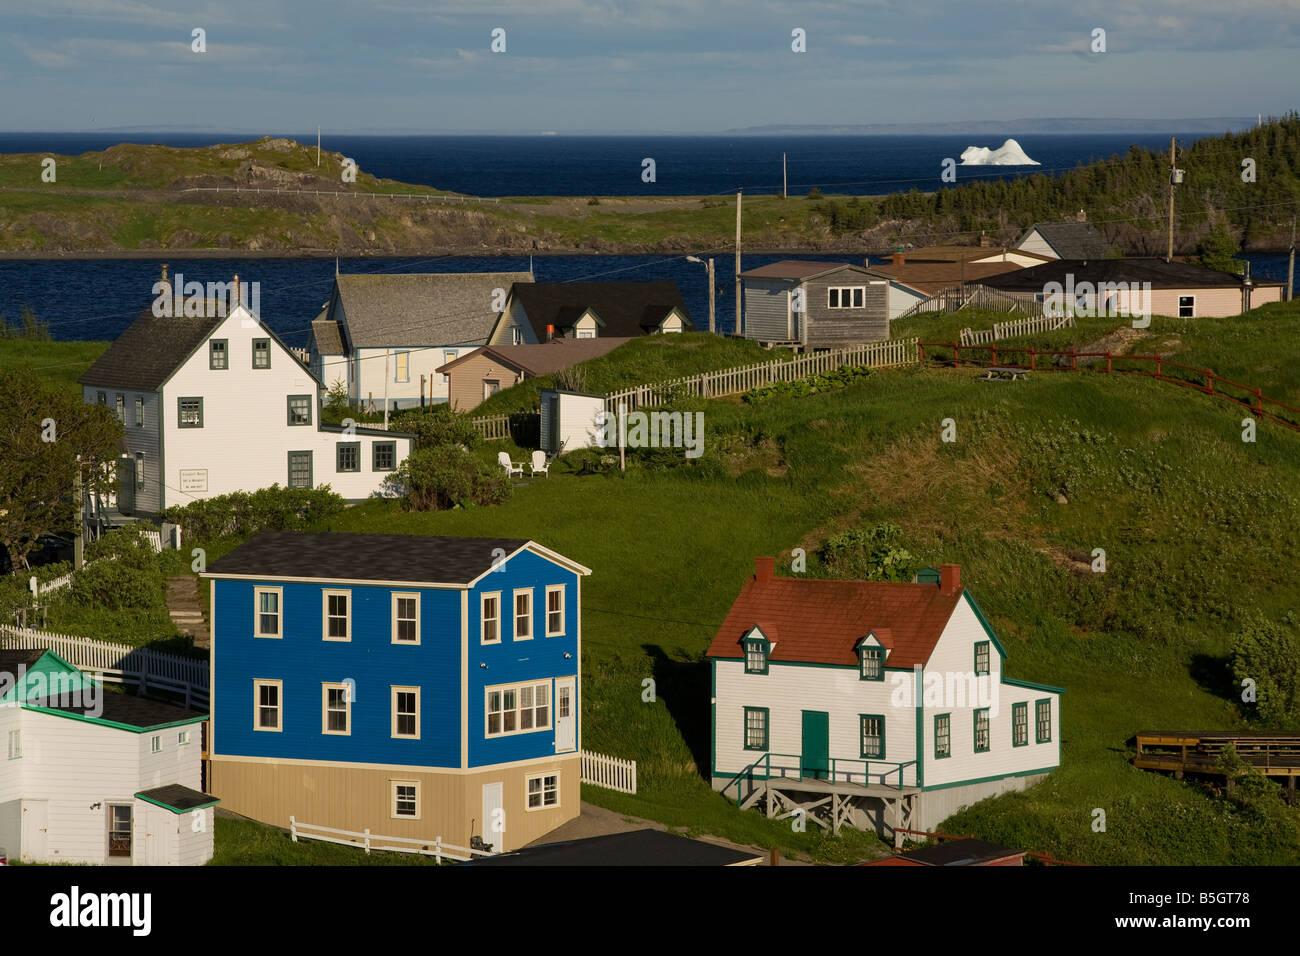 Terre-neuve-Labrador Canada Trinity Photo Stock